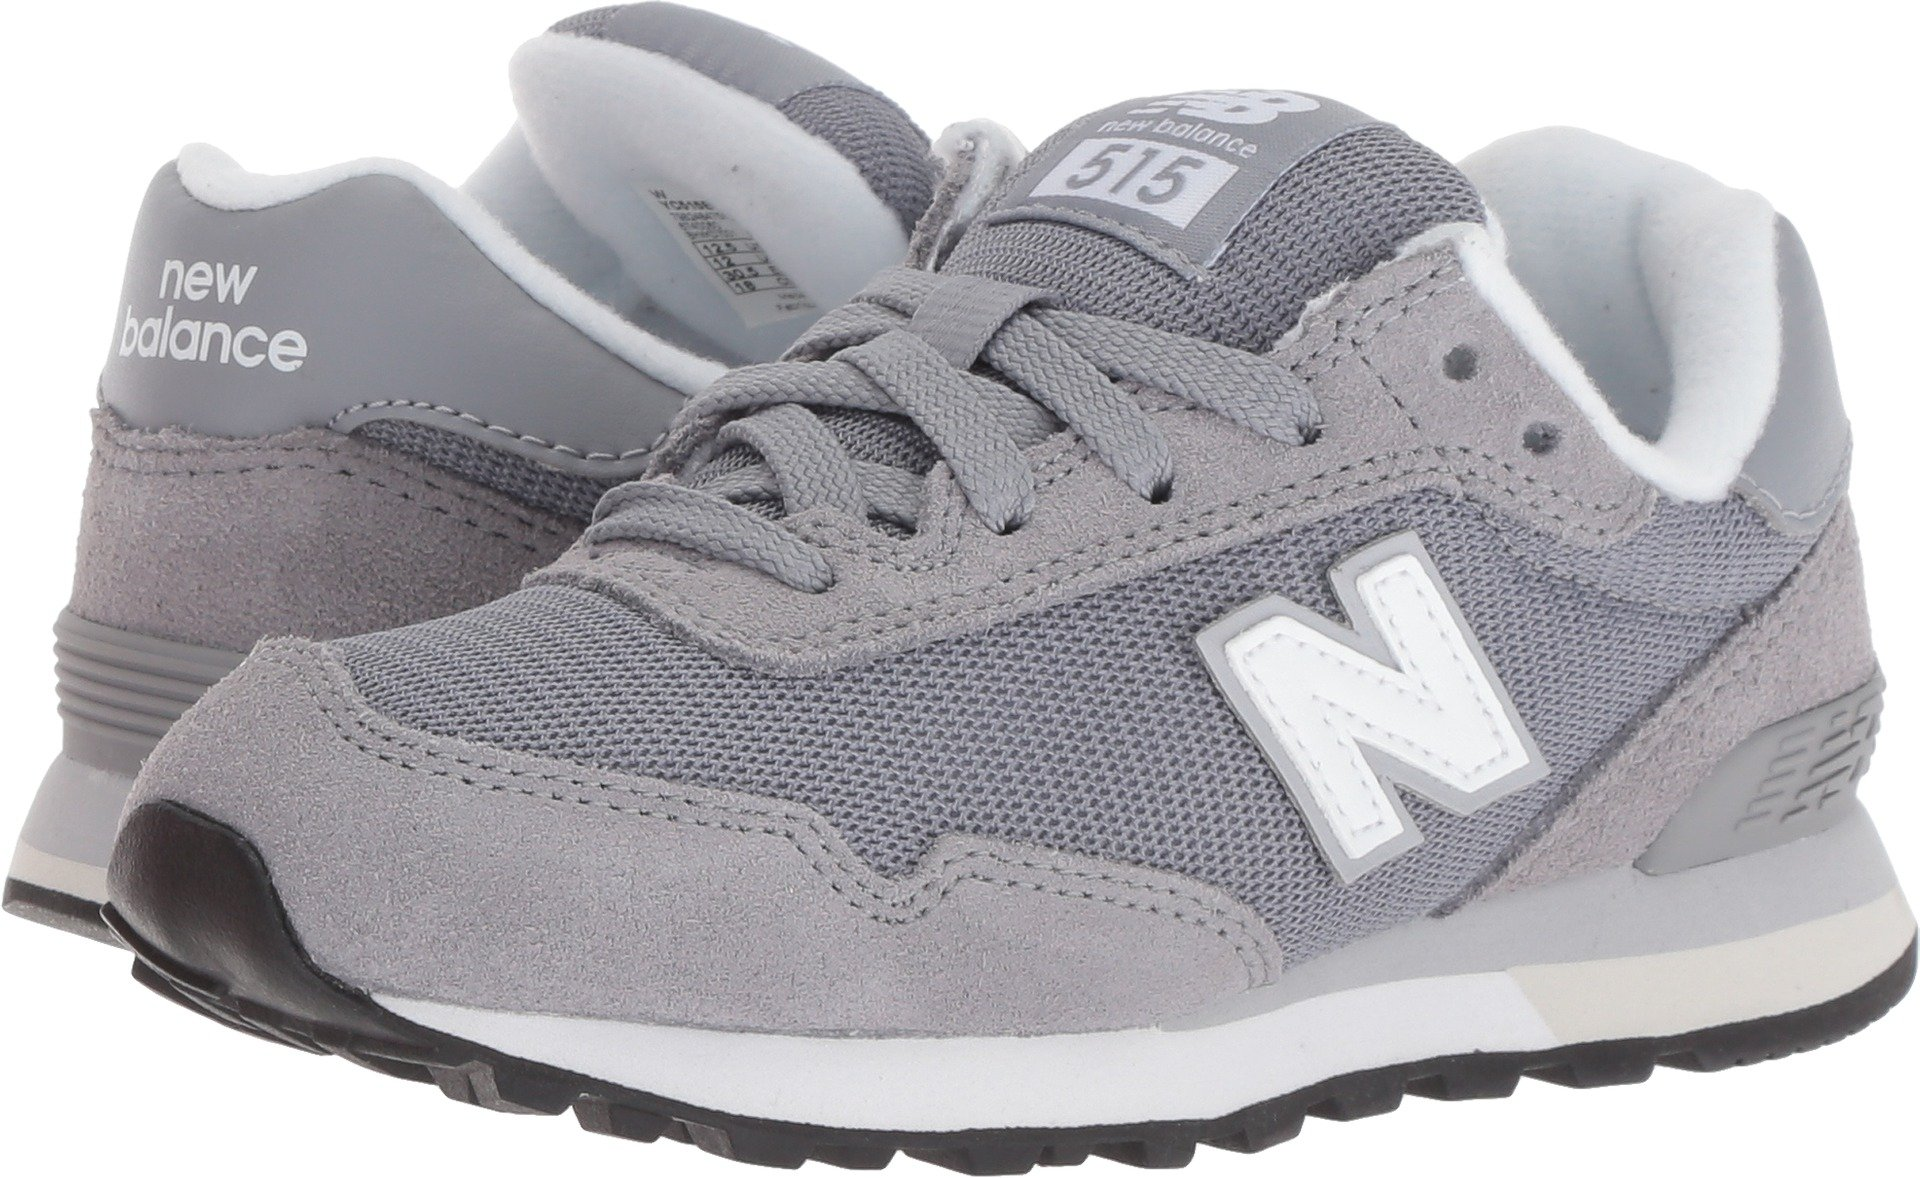 New Balance Boys' 515v1 Evergreen Sneaker, Grey/White, 3.5 W US Big Kid